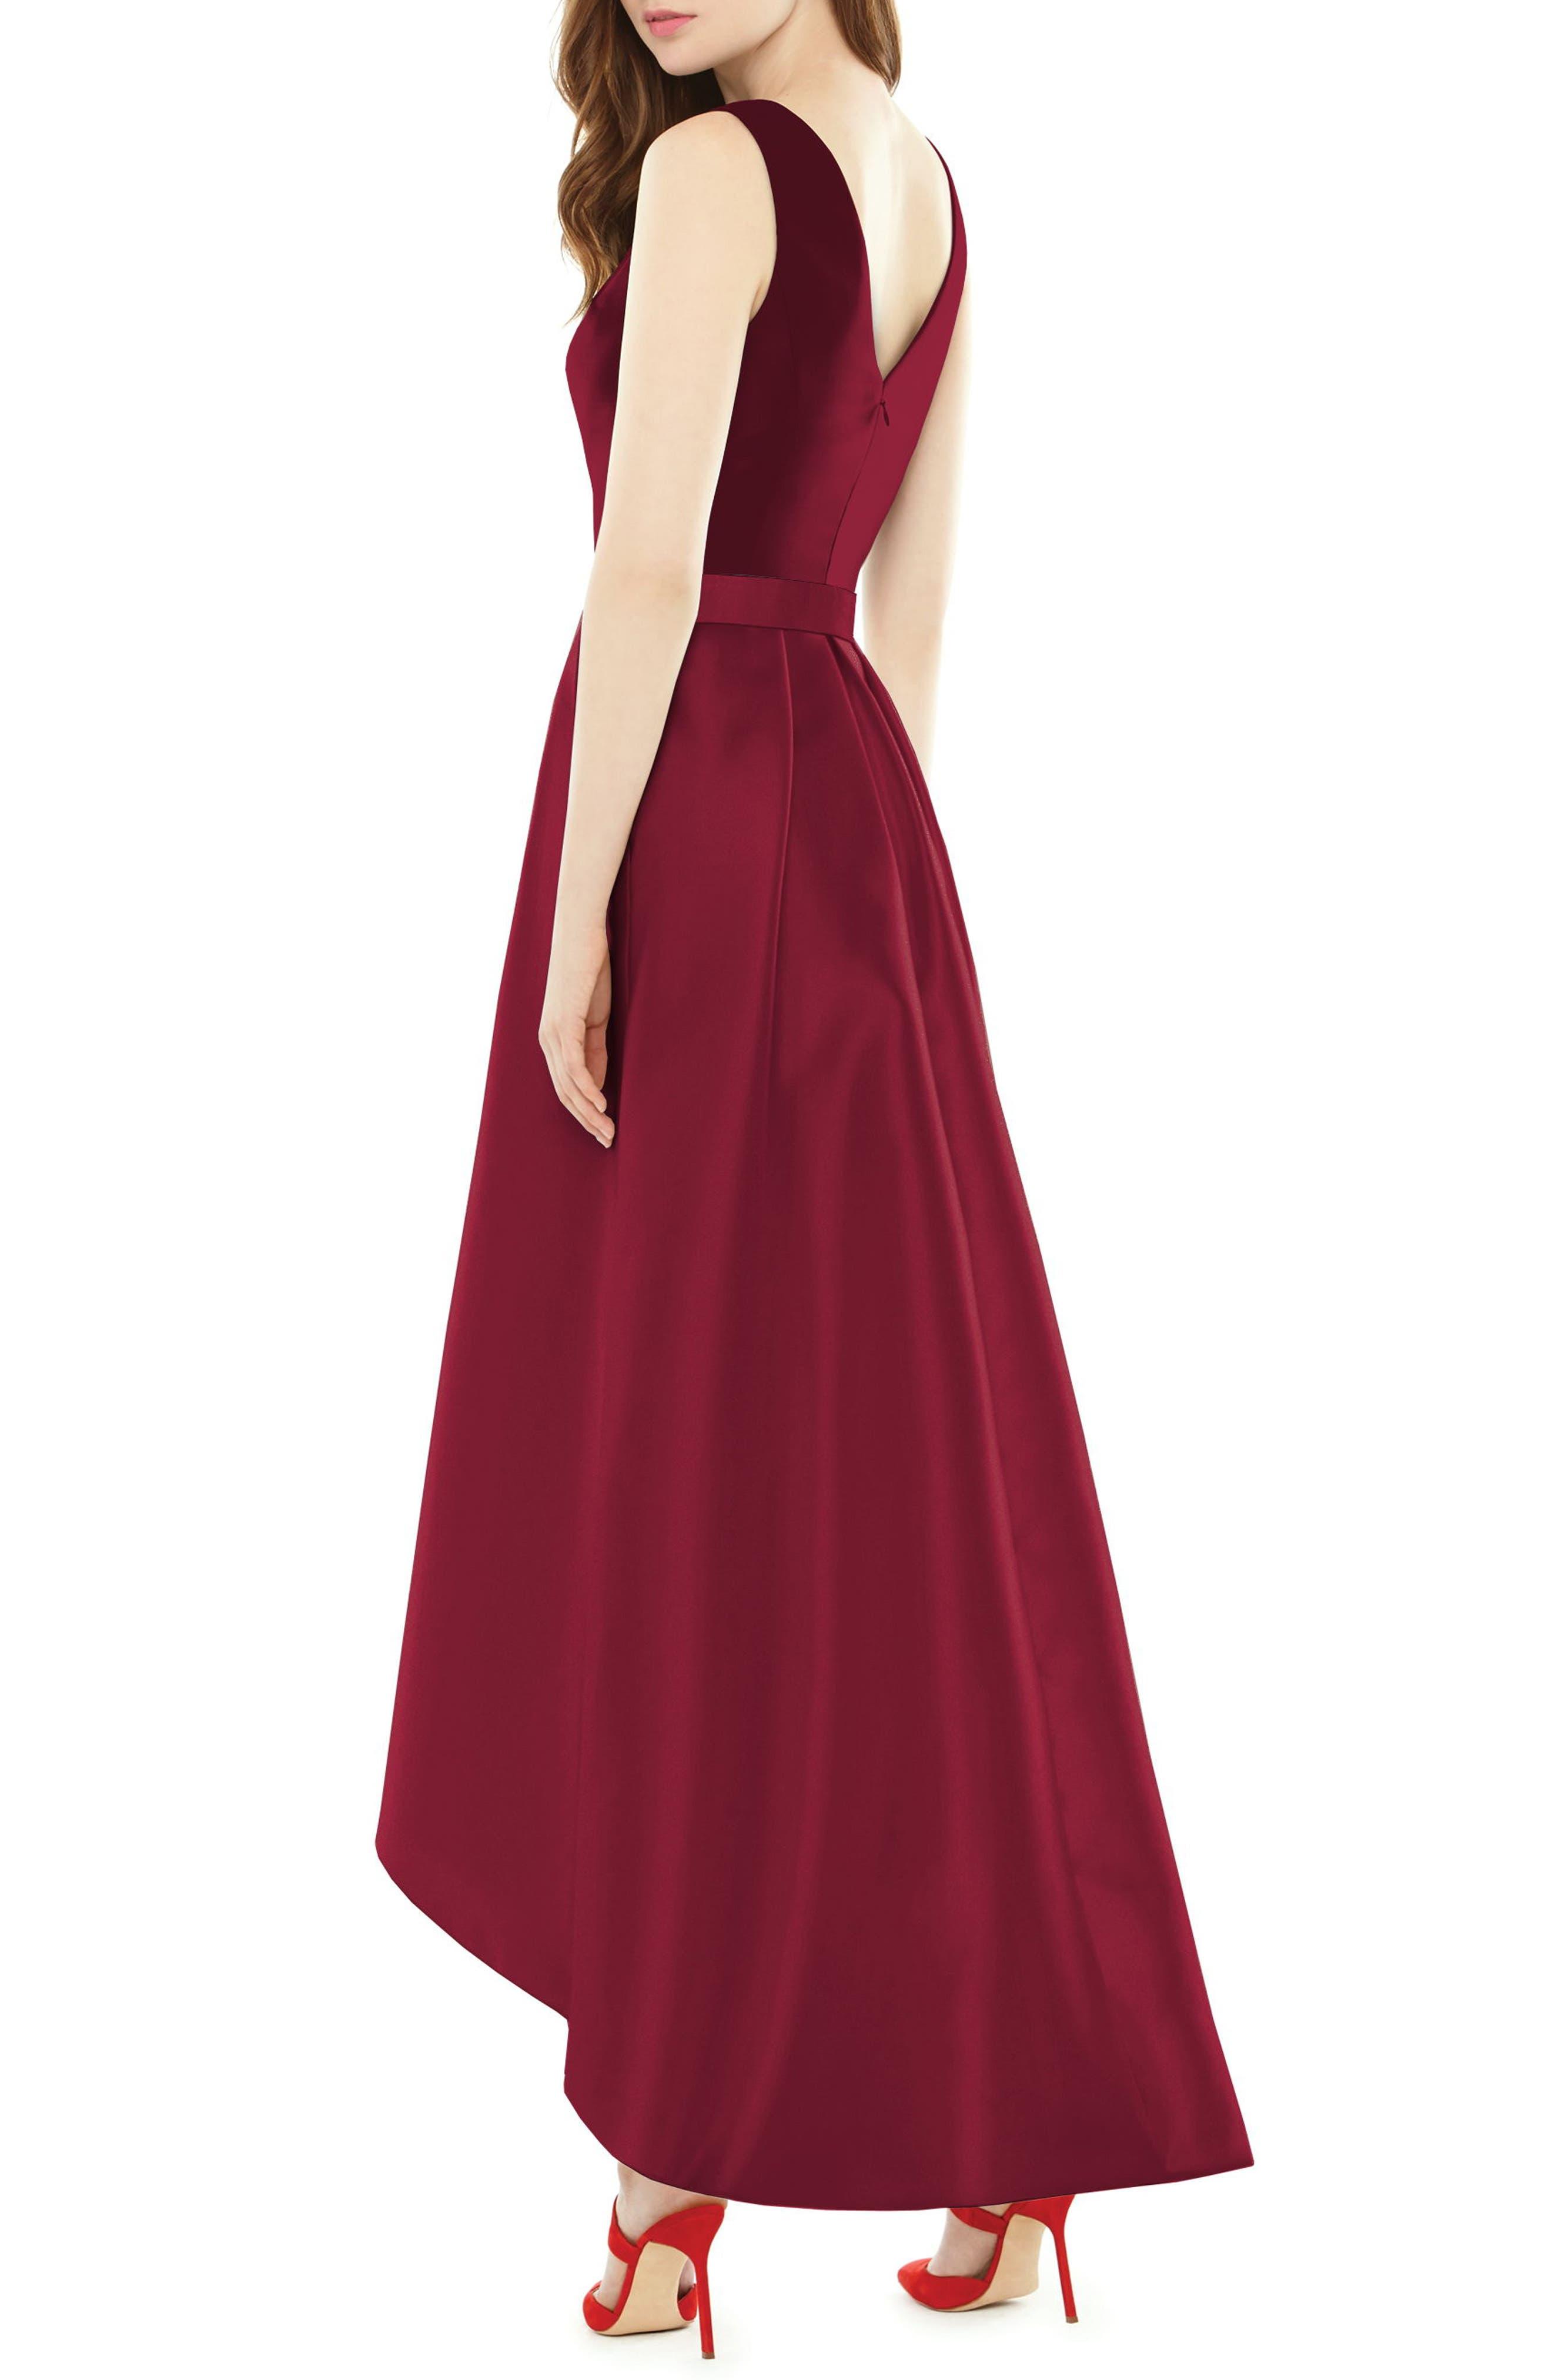 93caadbb4f95b Women's High Low Dresses | Nordstrom